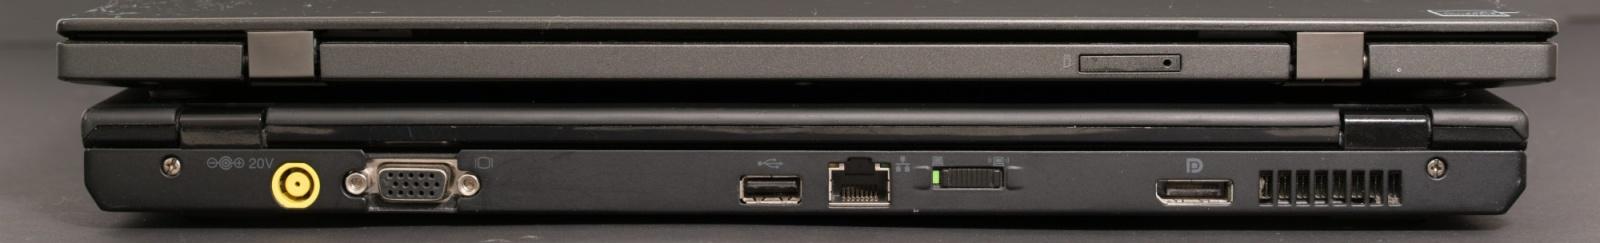 Древности: десять лет эволюции ноутбуков на примере ThinkPad X301 - 20